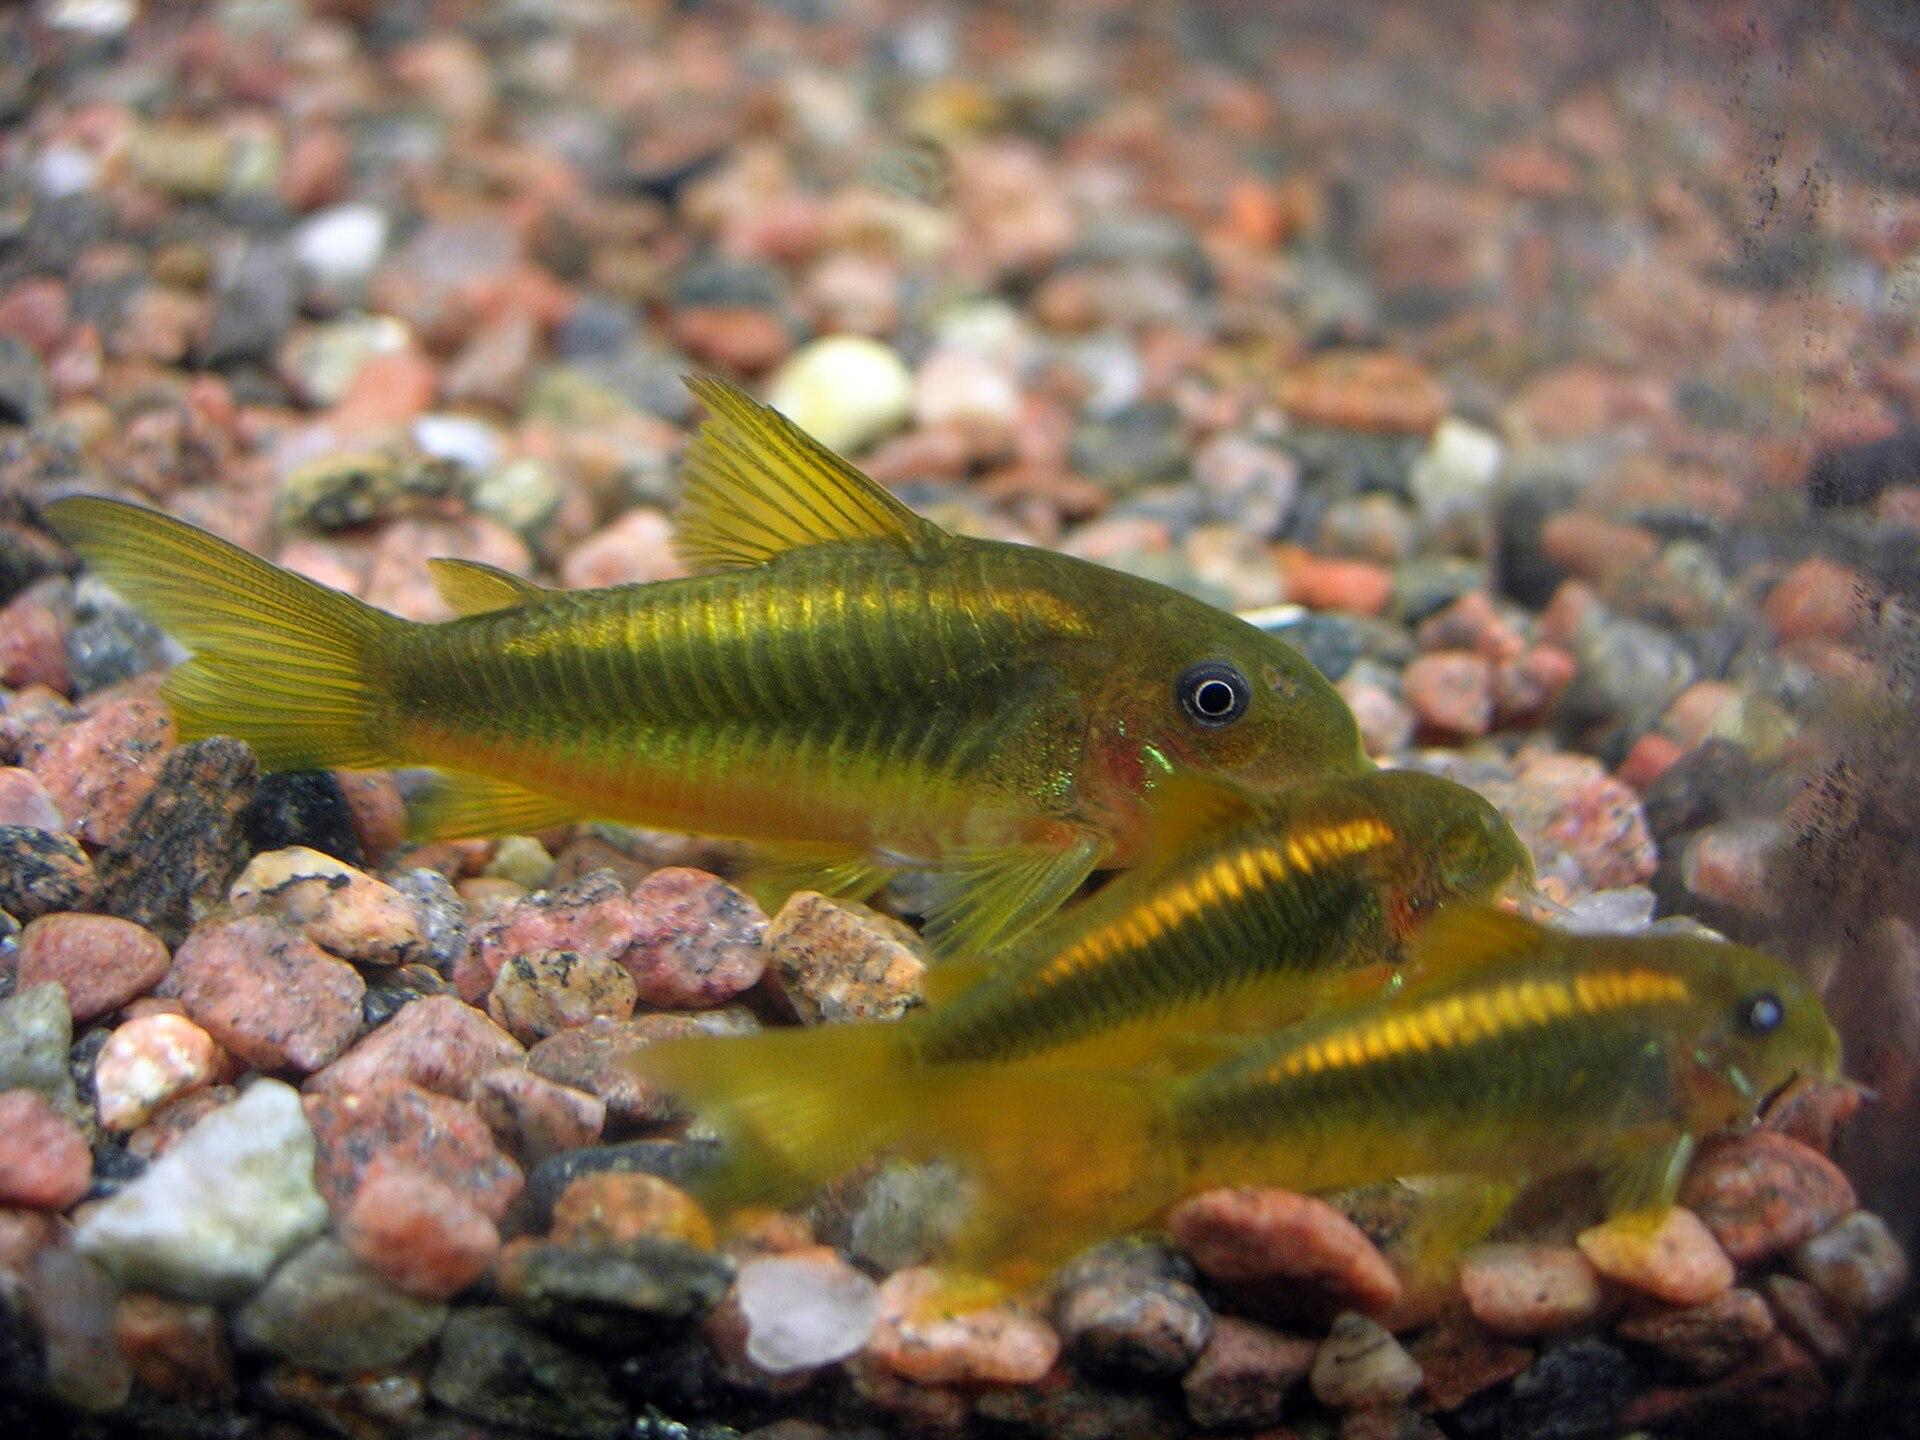 Cory Cat Fish Eggs Getting Eaten By Angelfish